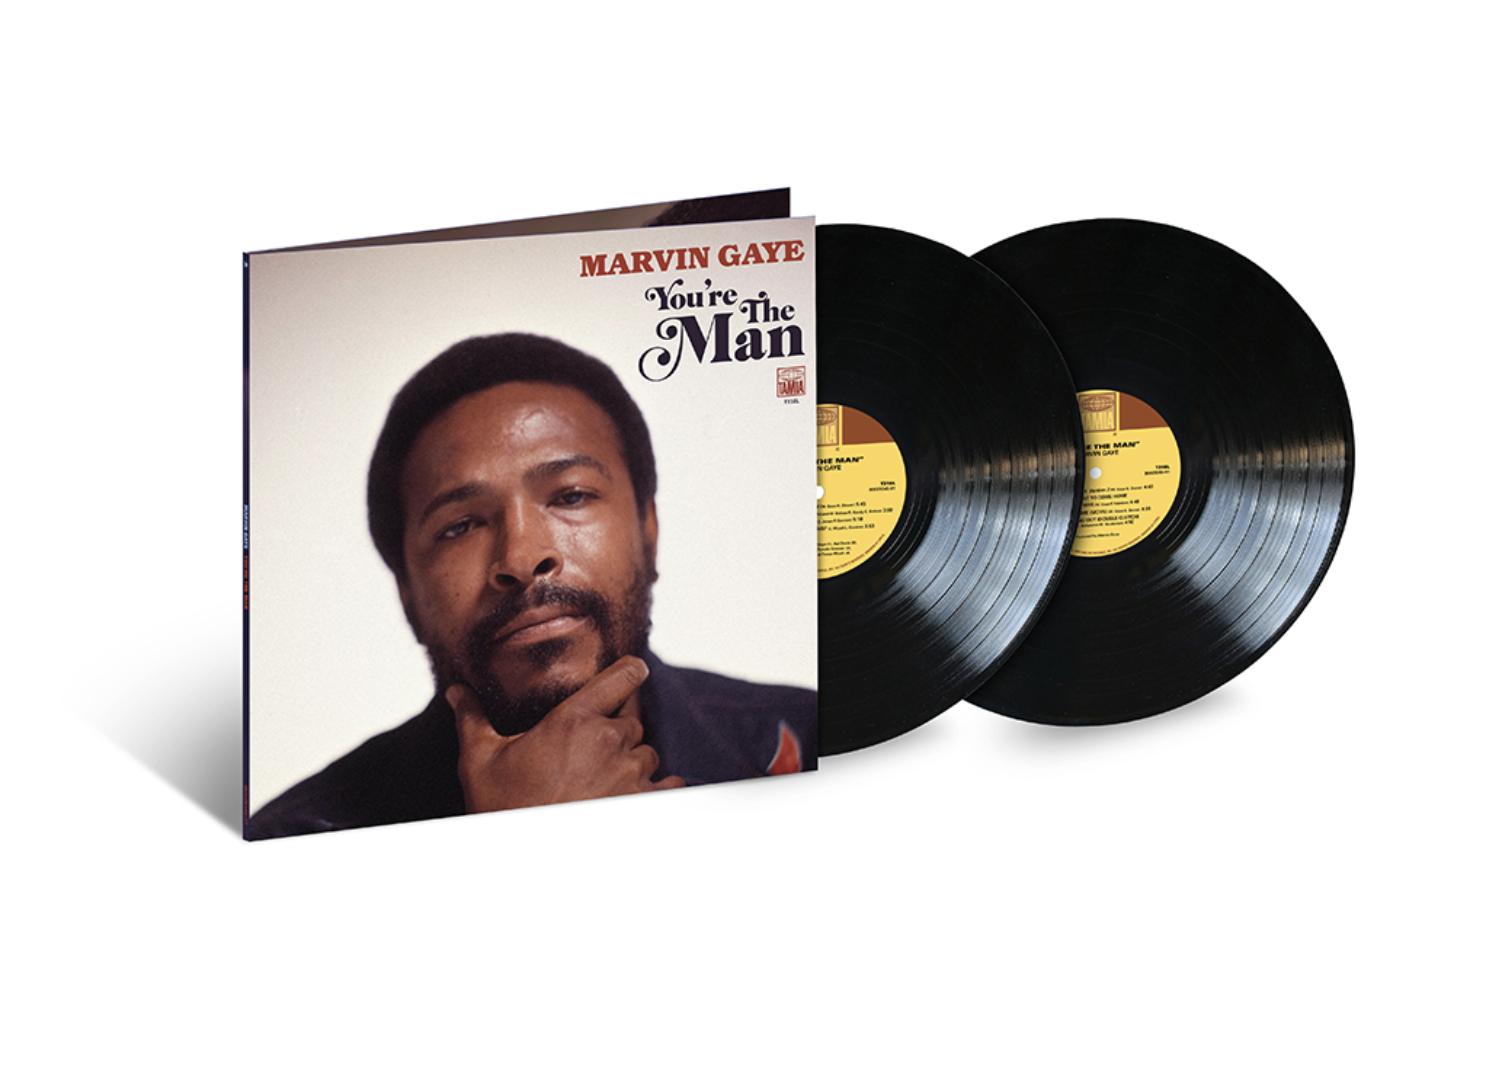 Marvin Gaye lost album